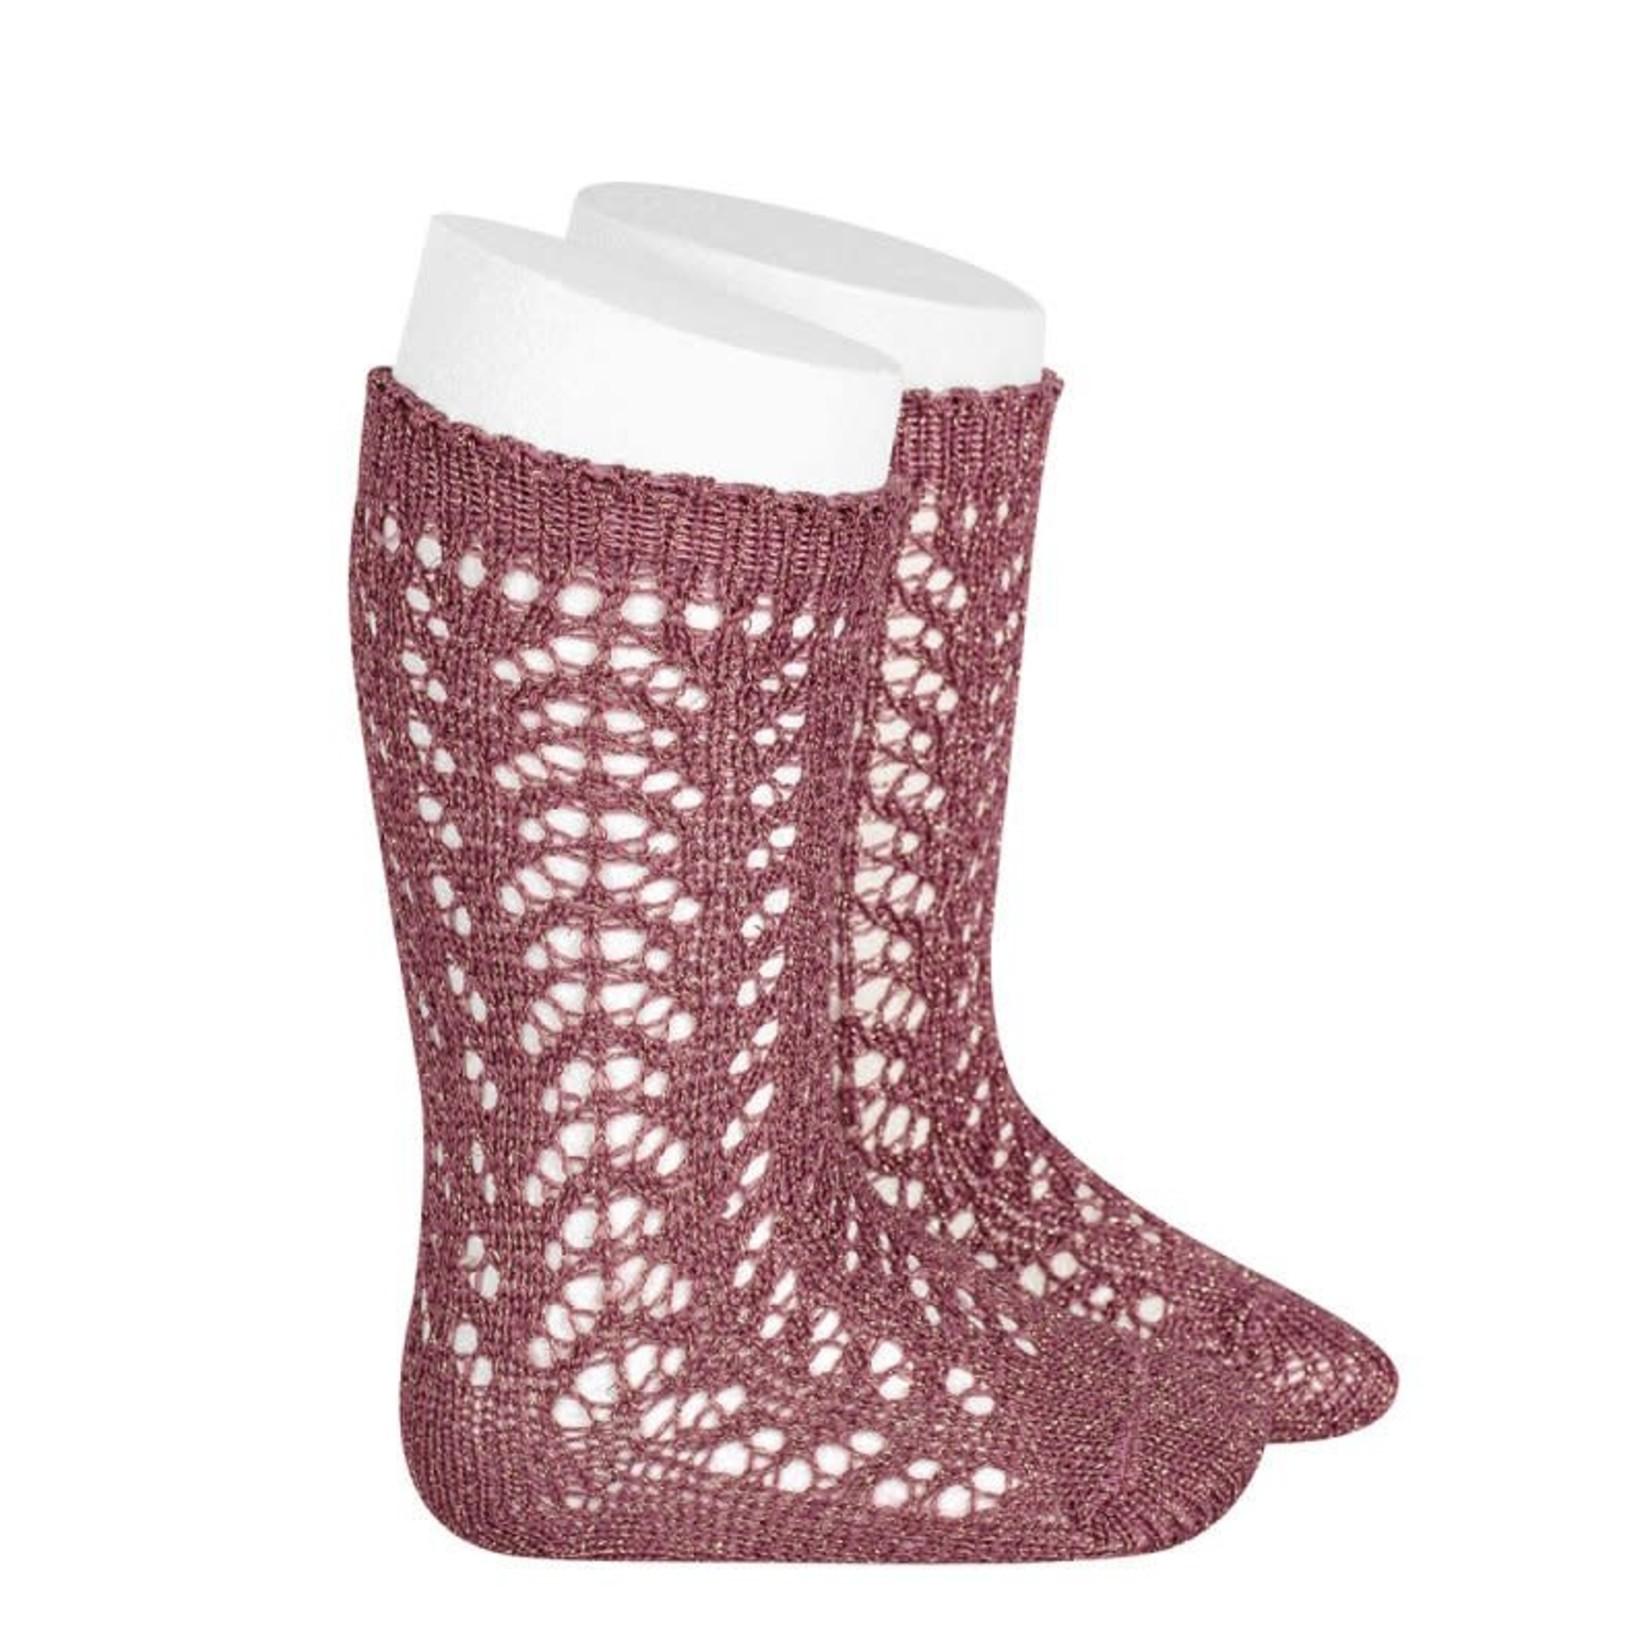 Condor Metallic Socks - Tamariks